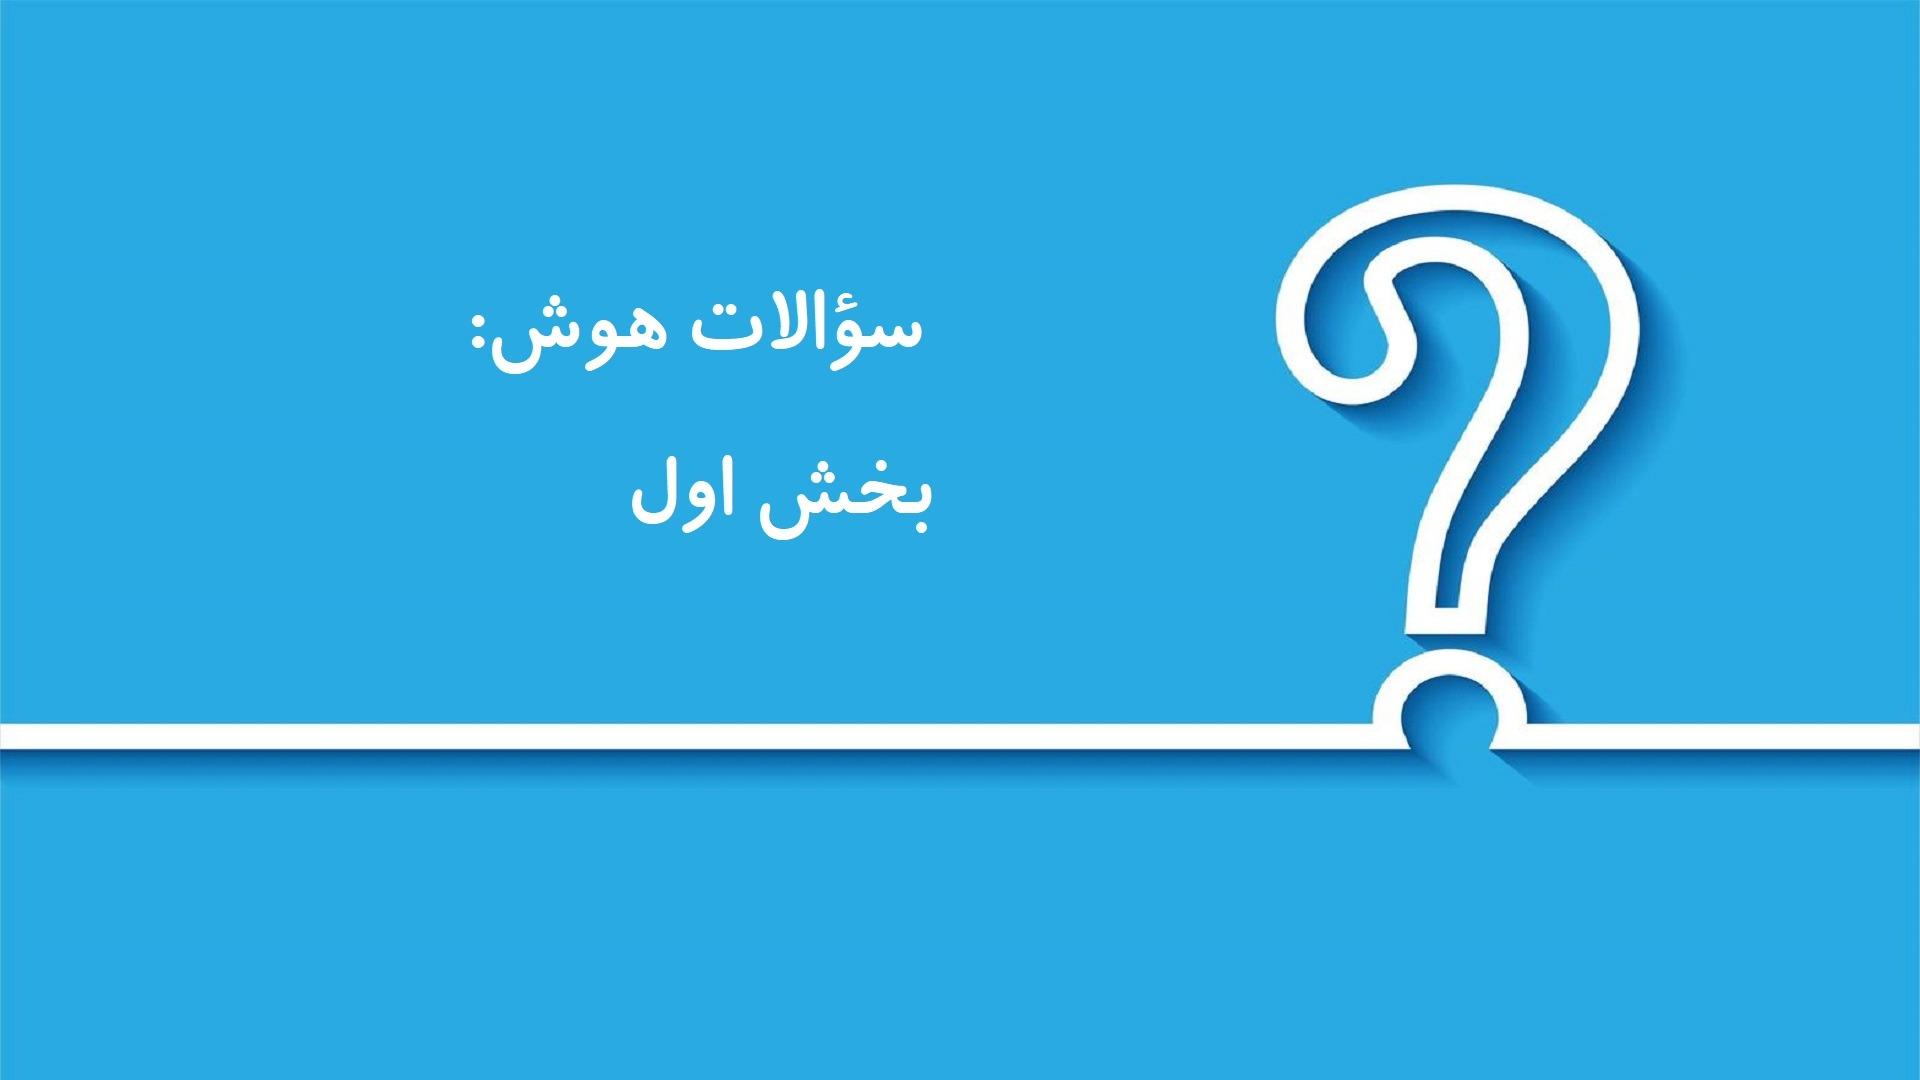 سؤال هوش 1